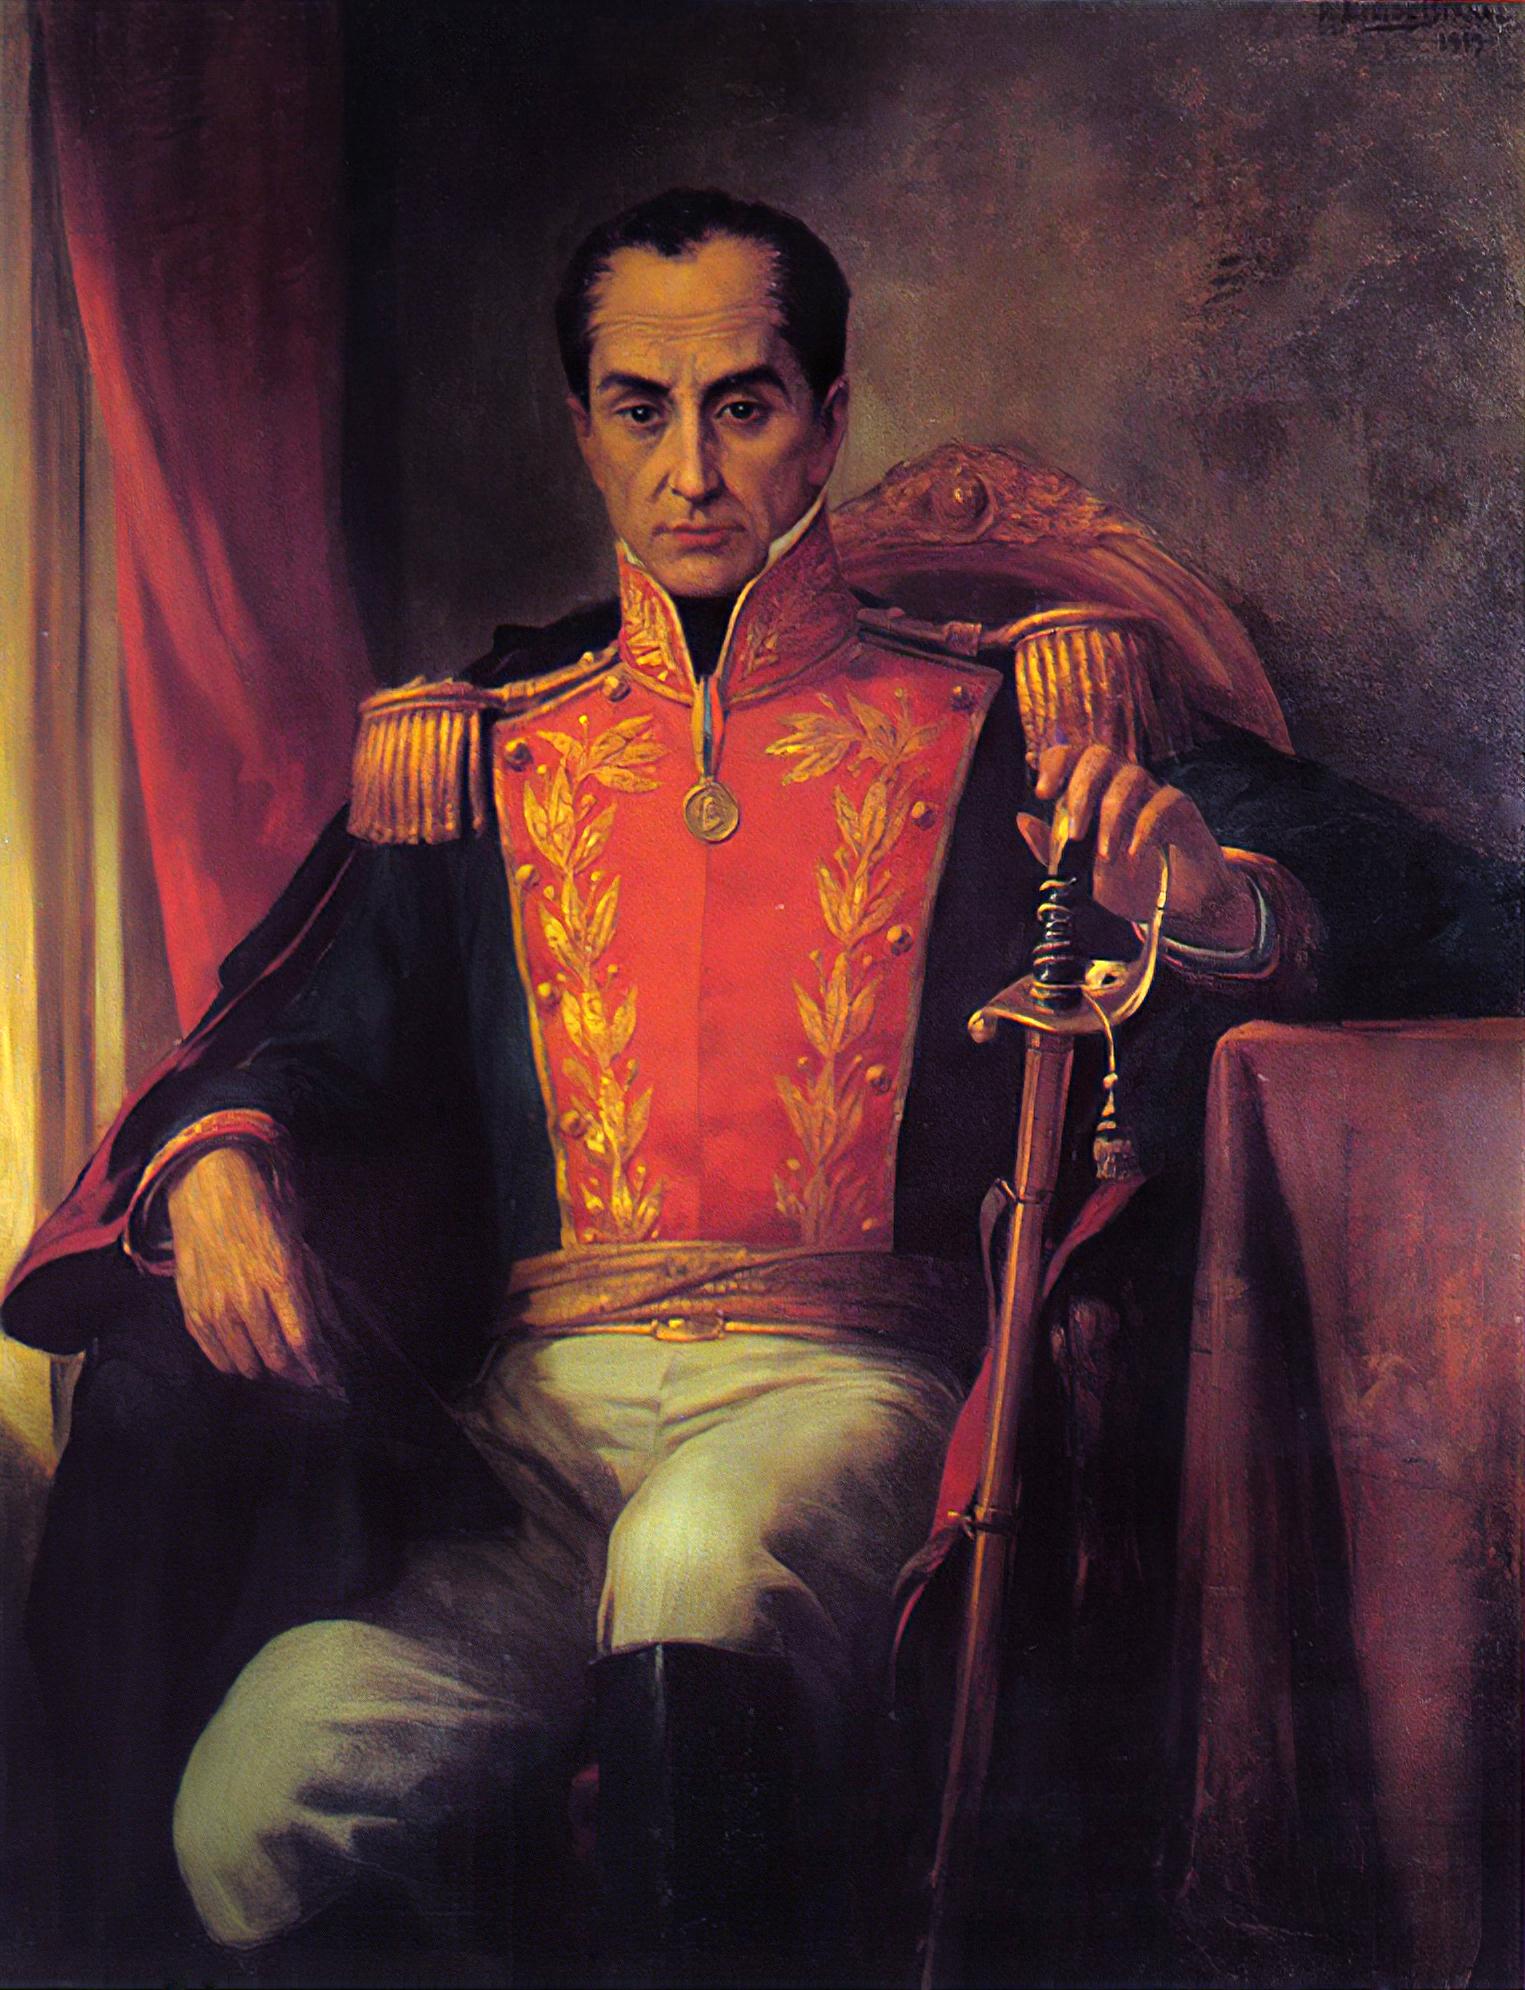 Archivo:Simón Bolívar 2.jpg